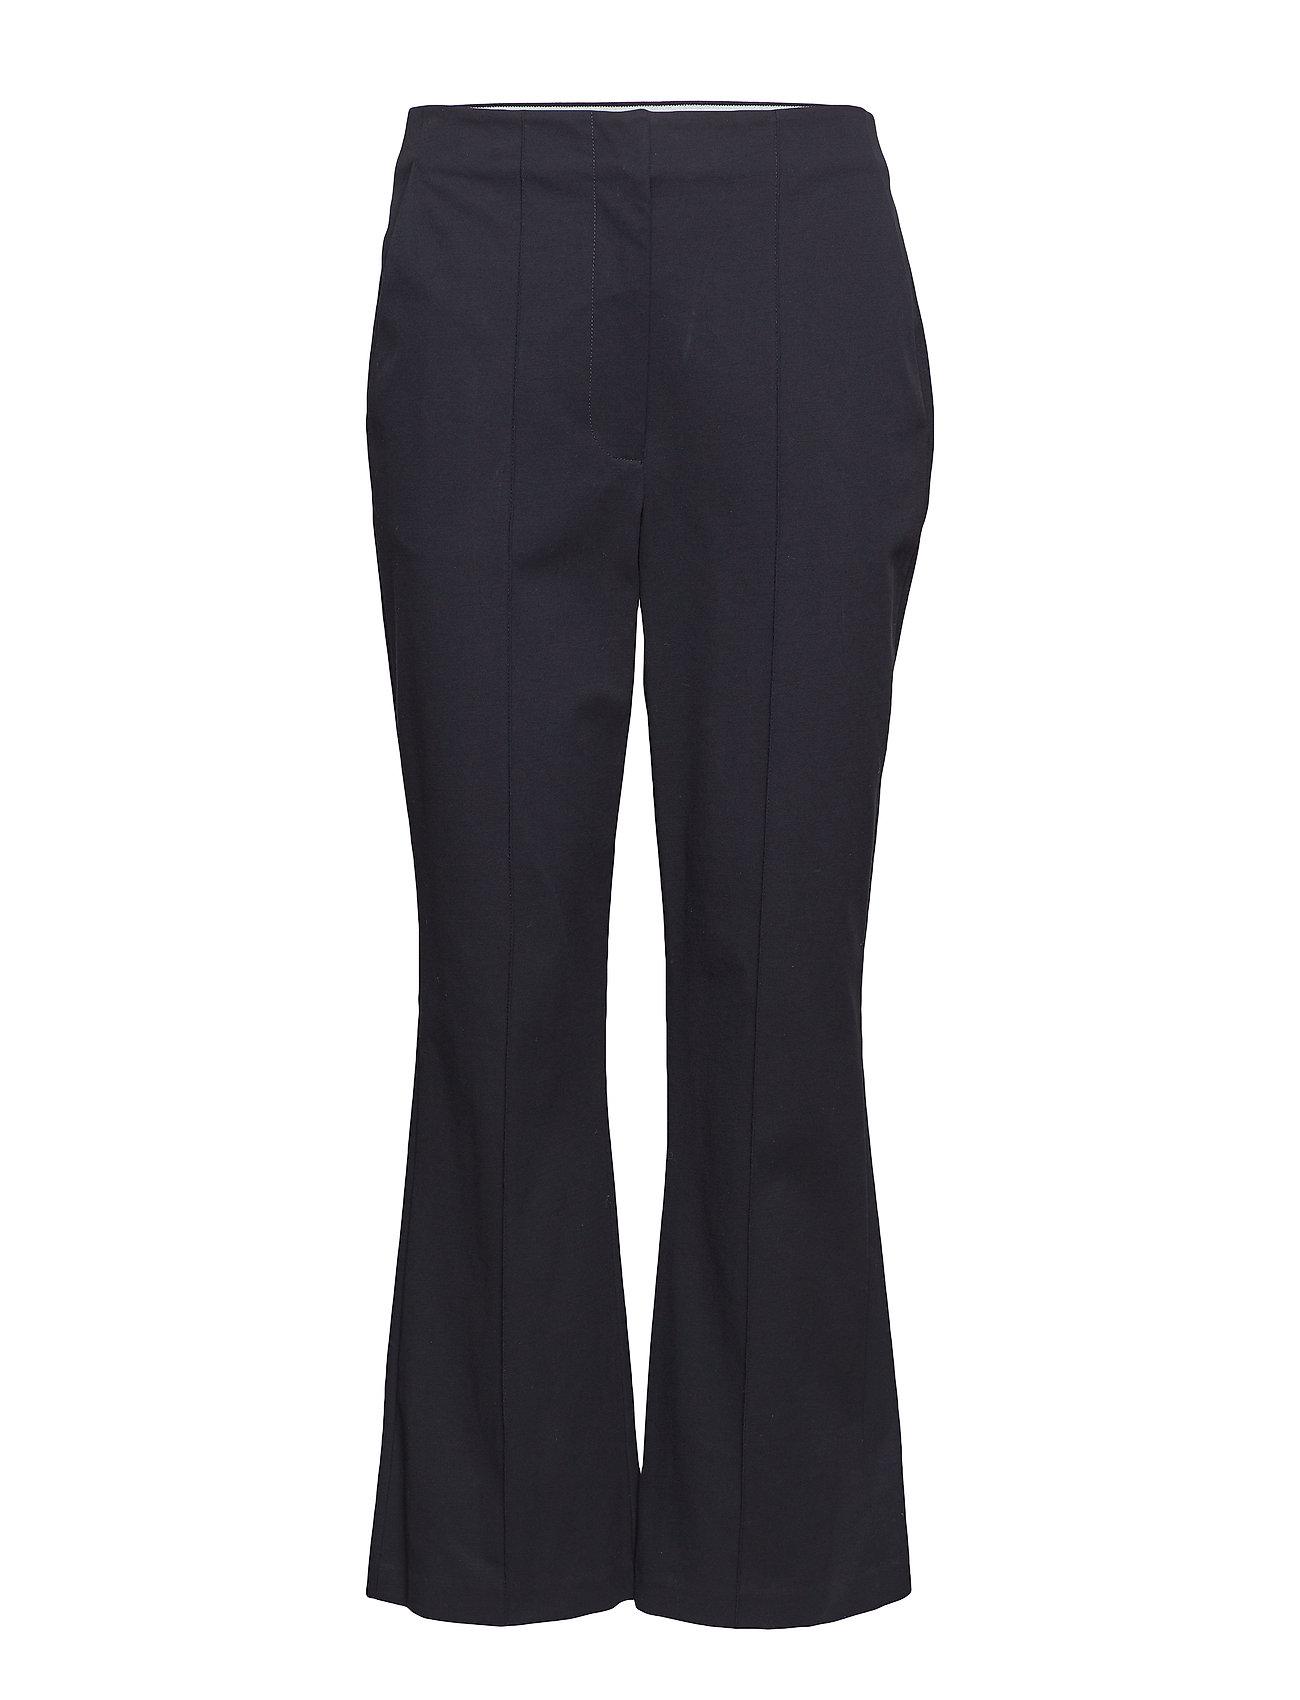 Image of Stretch Suiting Pant Withlogo Elastic Detail Bukser Med Svaj Sort T BY ALEXANDER WANG (3093081967)